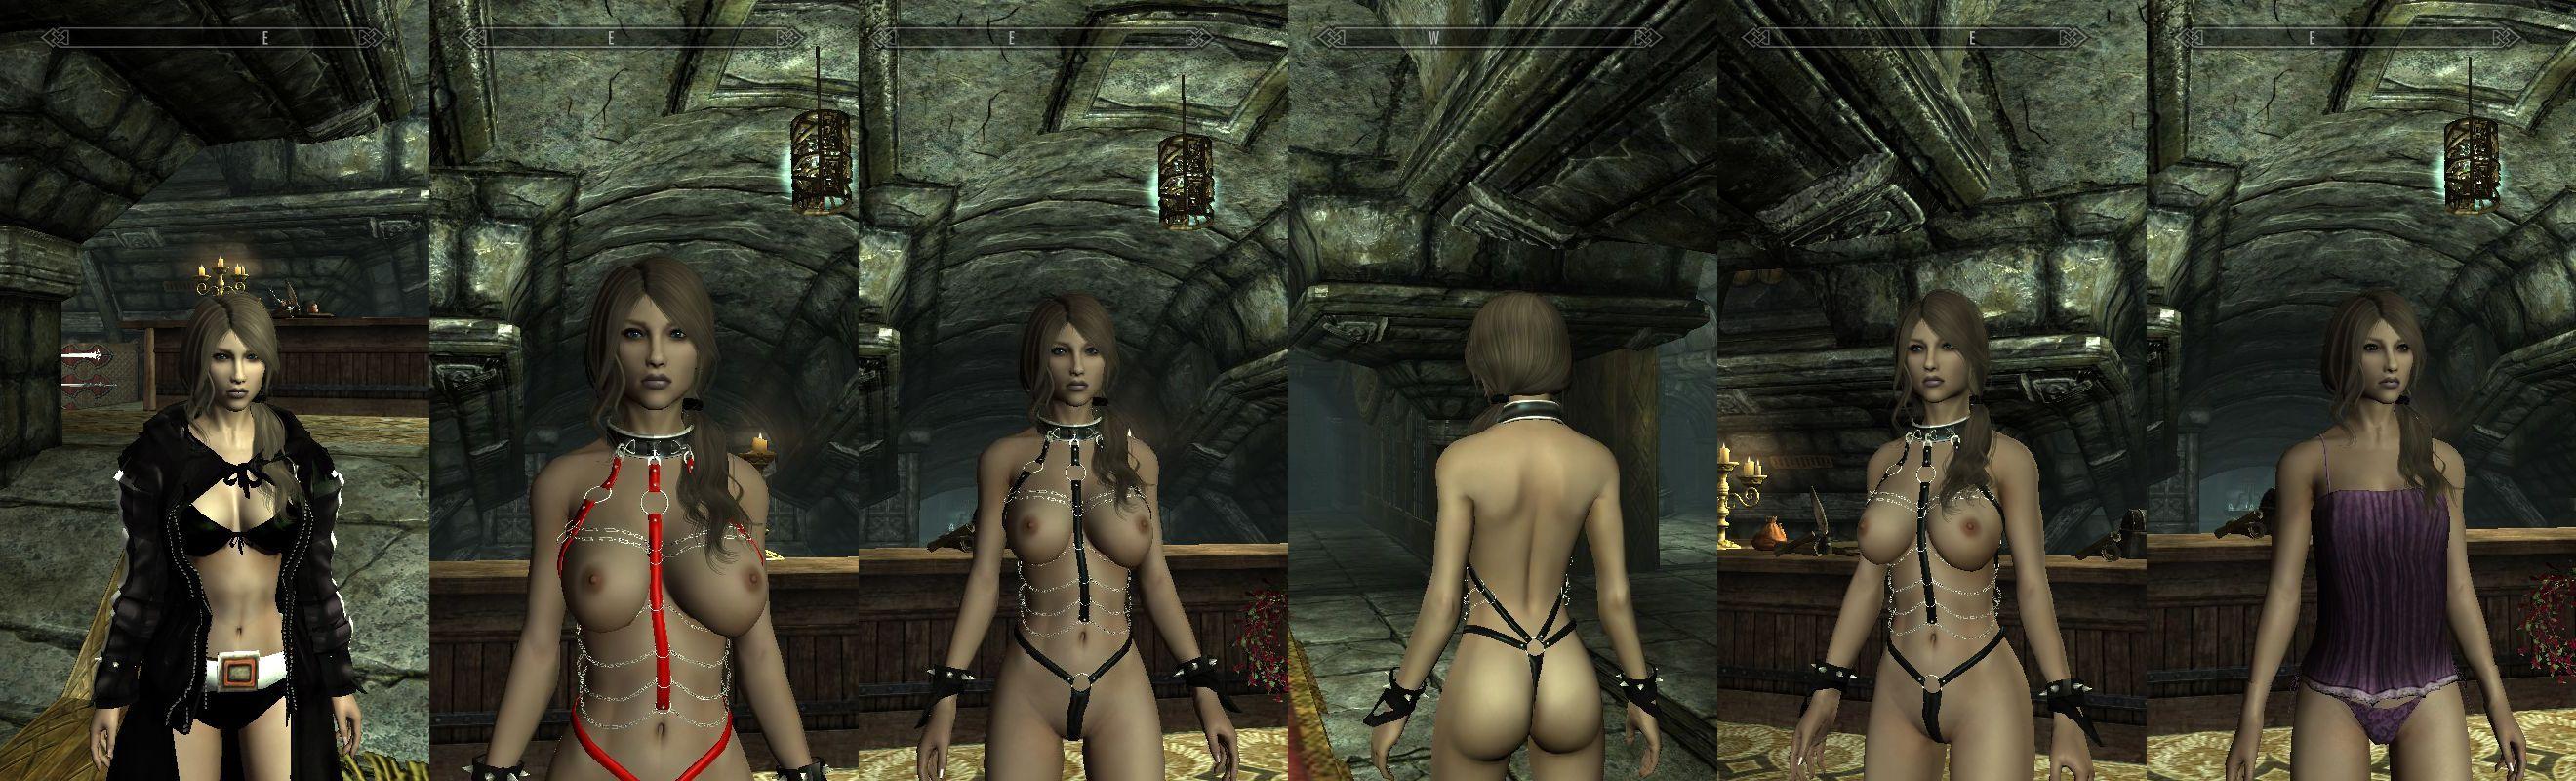 Free xxx angel demon porn pictures nackt image